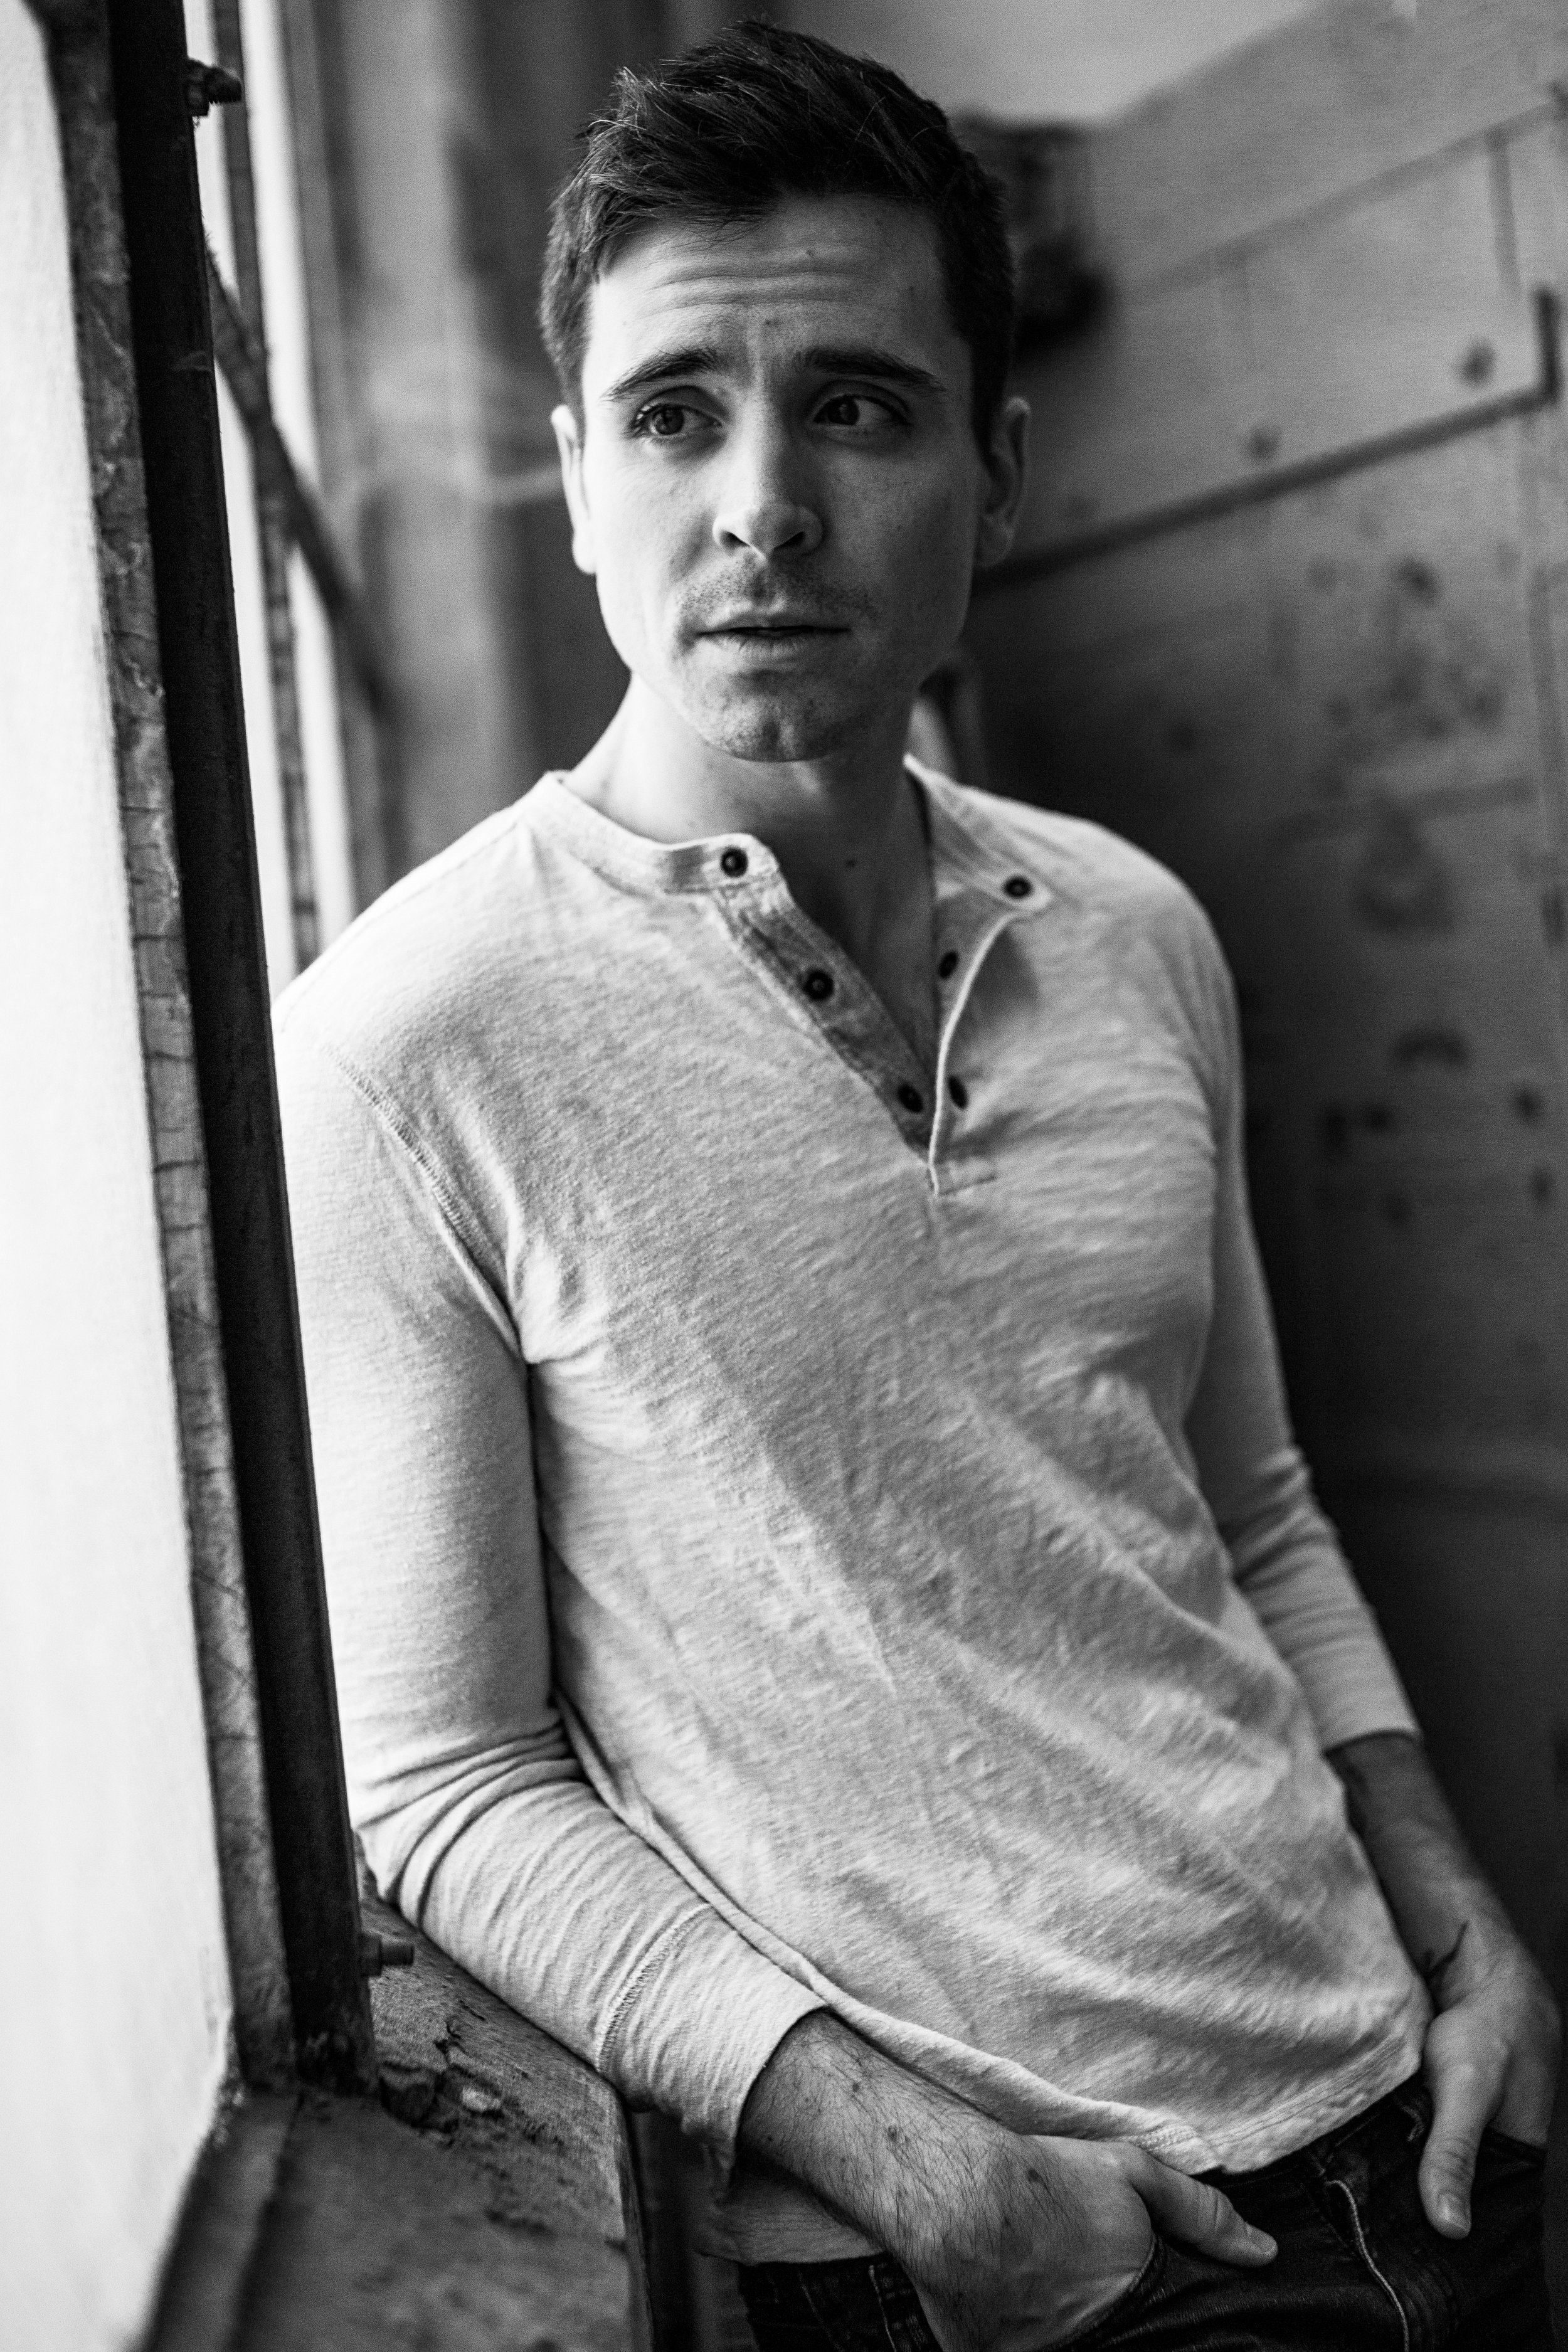 Matt Doyle @ North Studios - Dec 2018-22.jpg